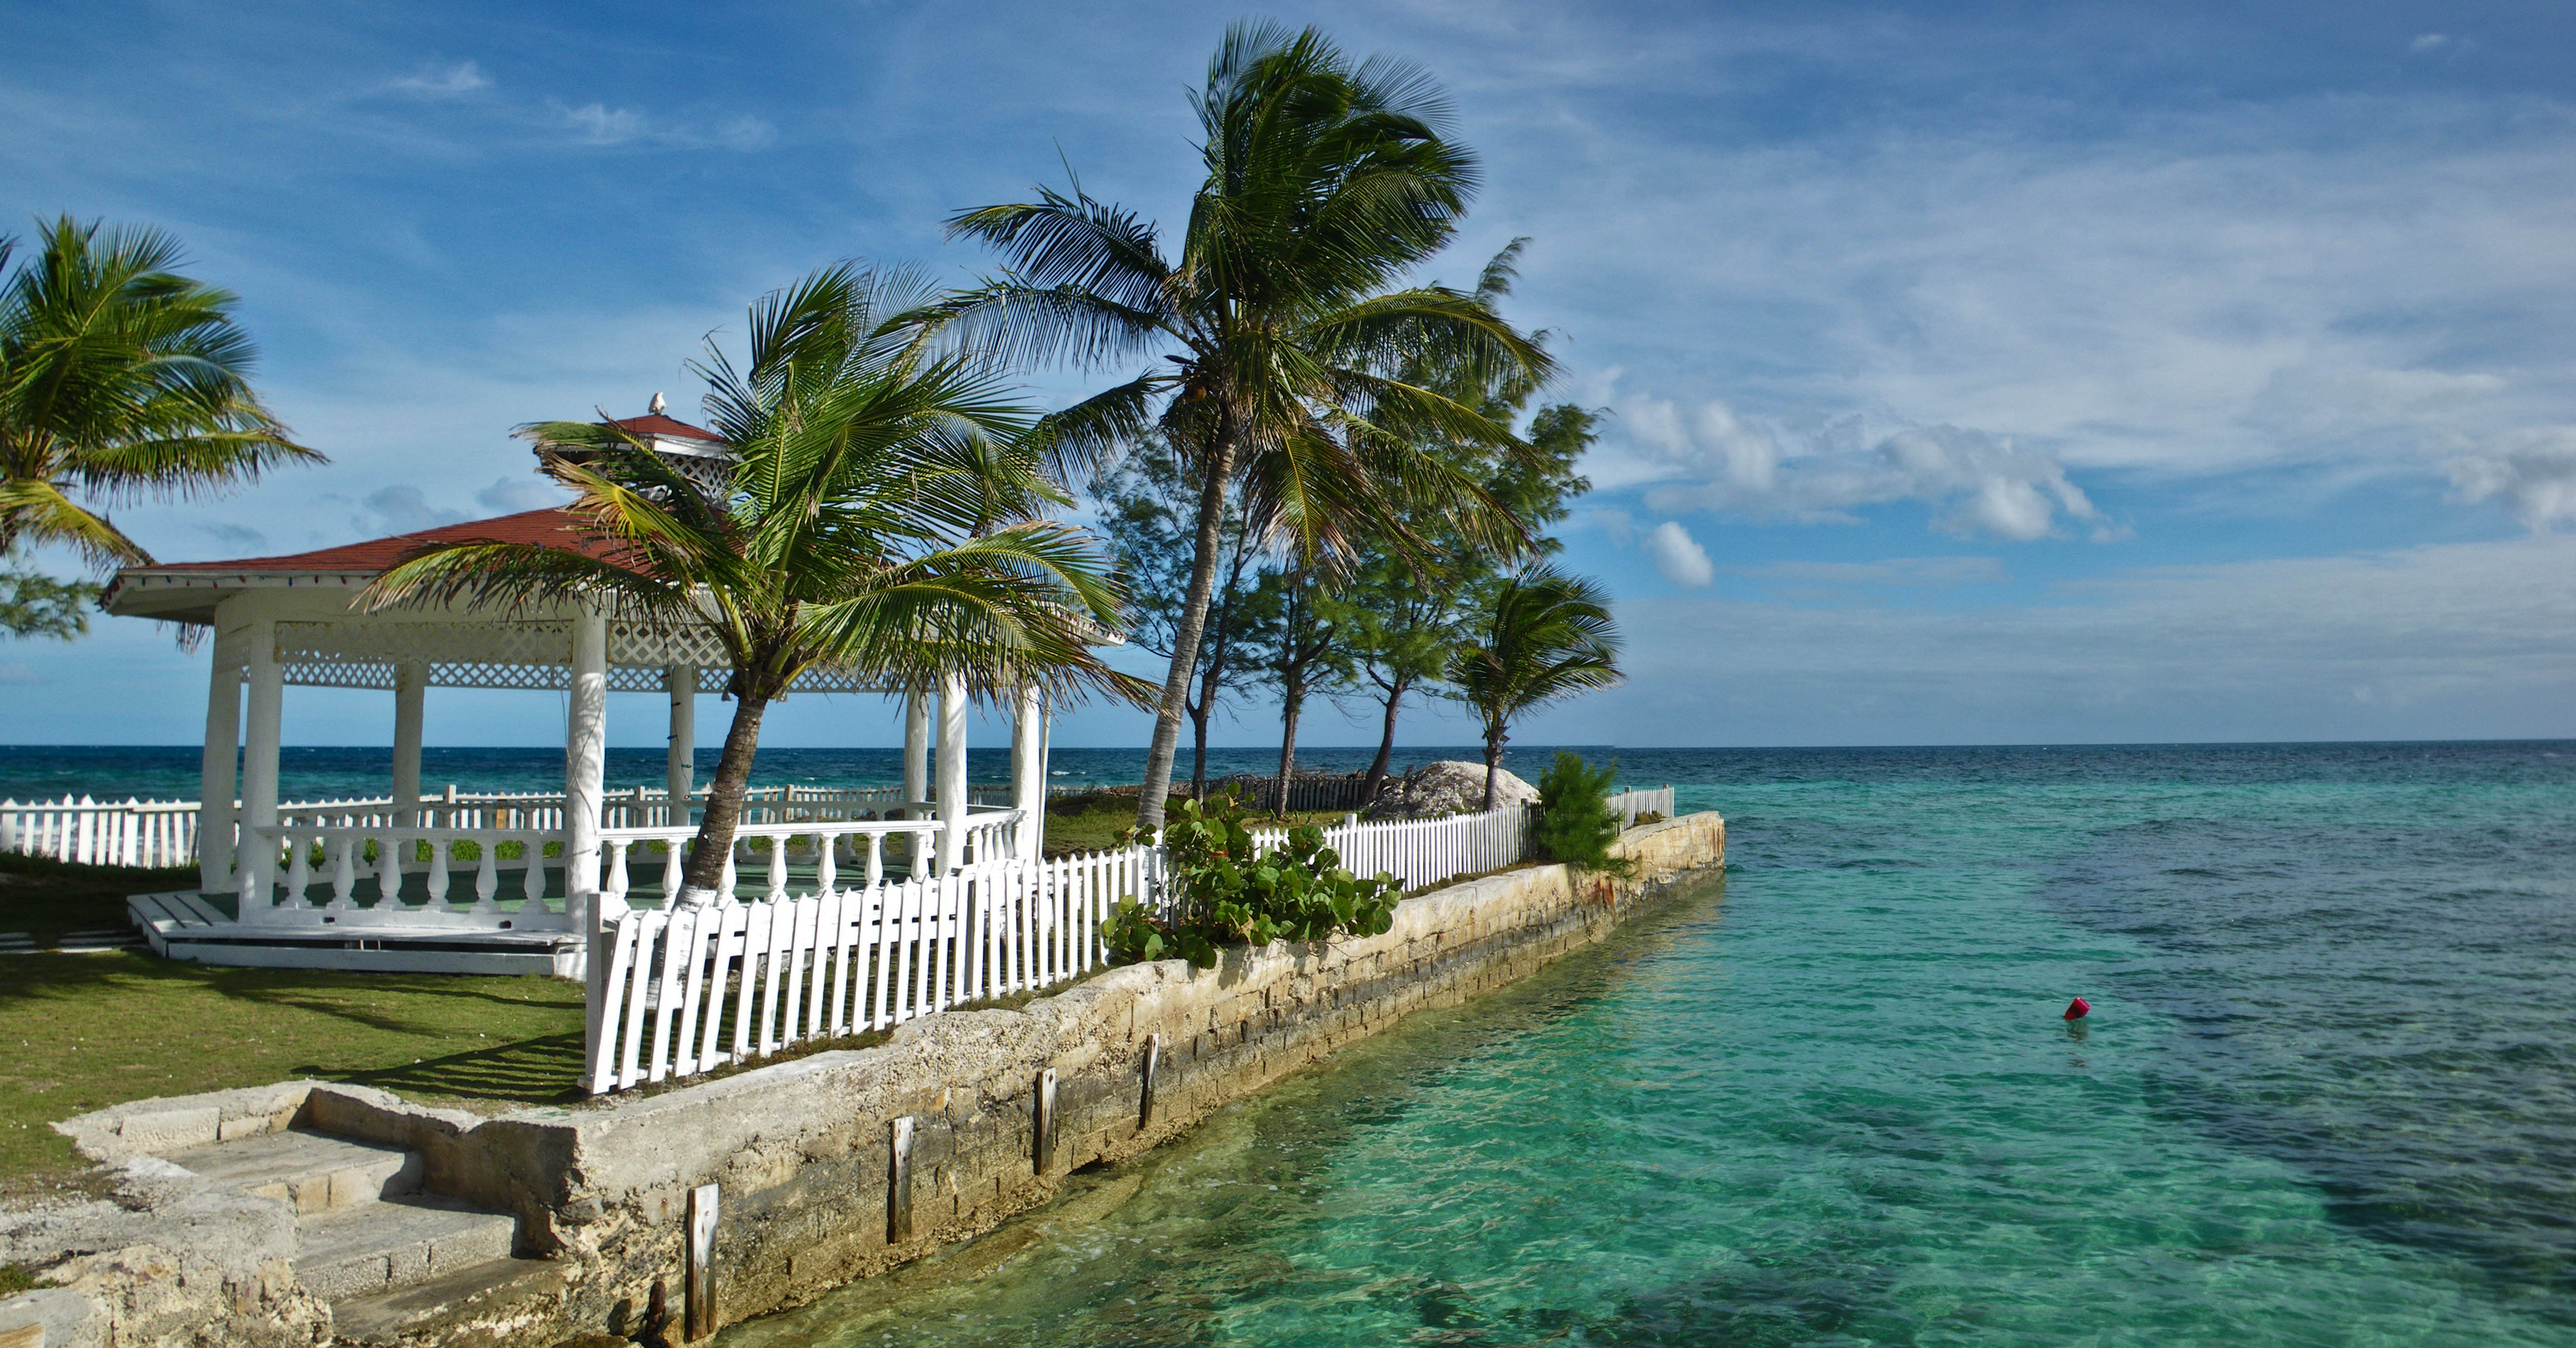 New Providence, Bahamas - by Bryce Edwards